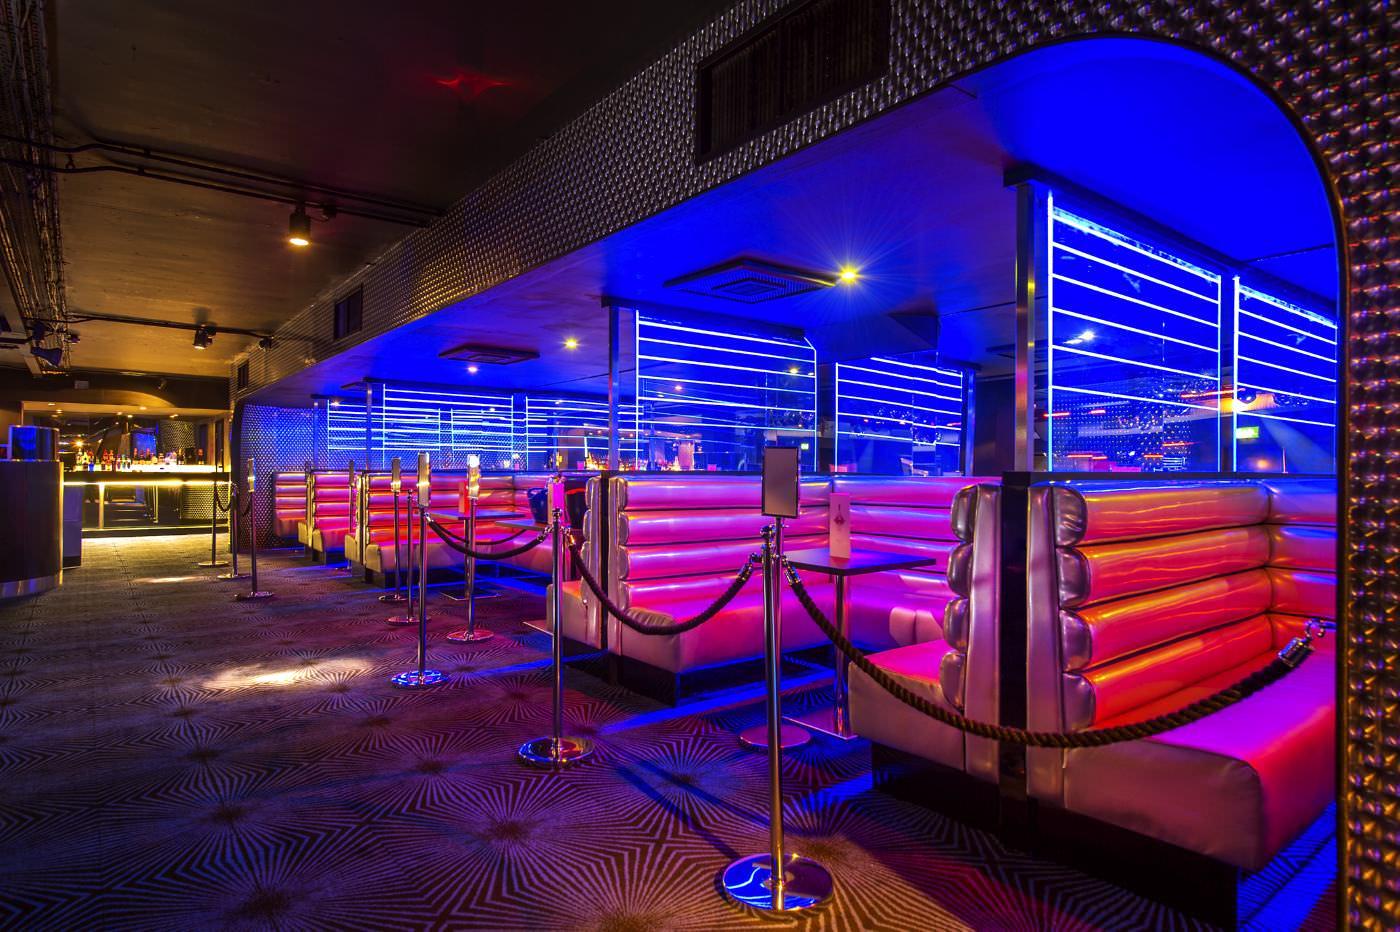 Ballare nightclub seating